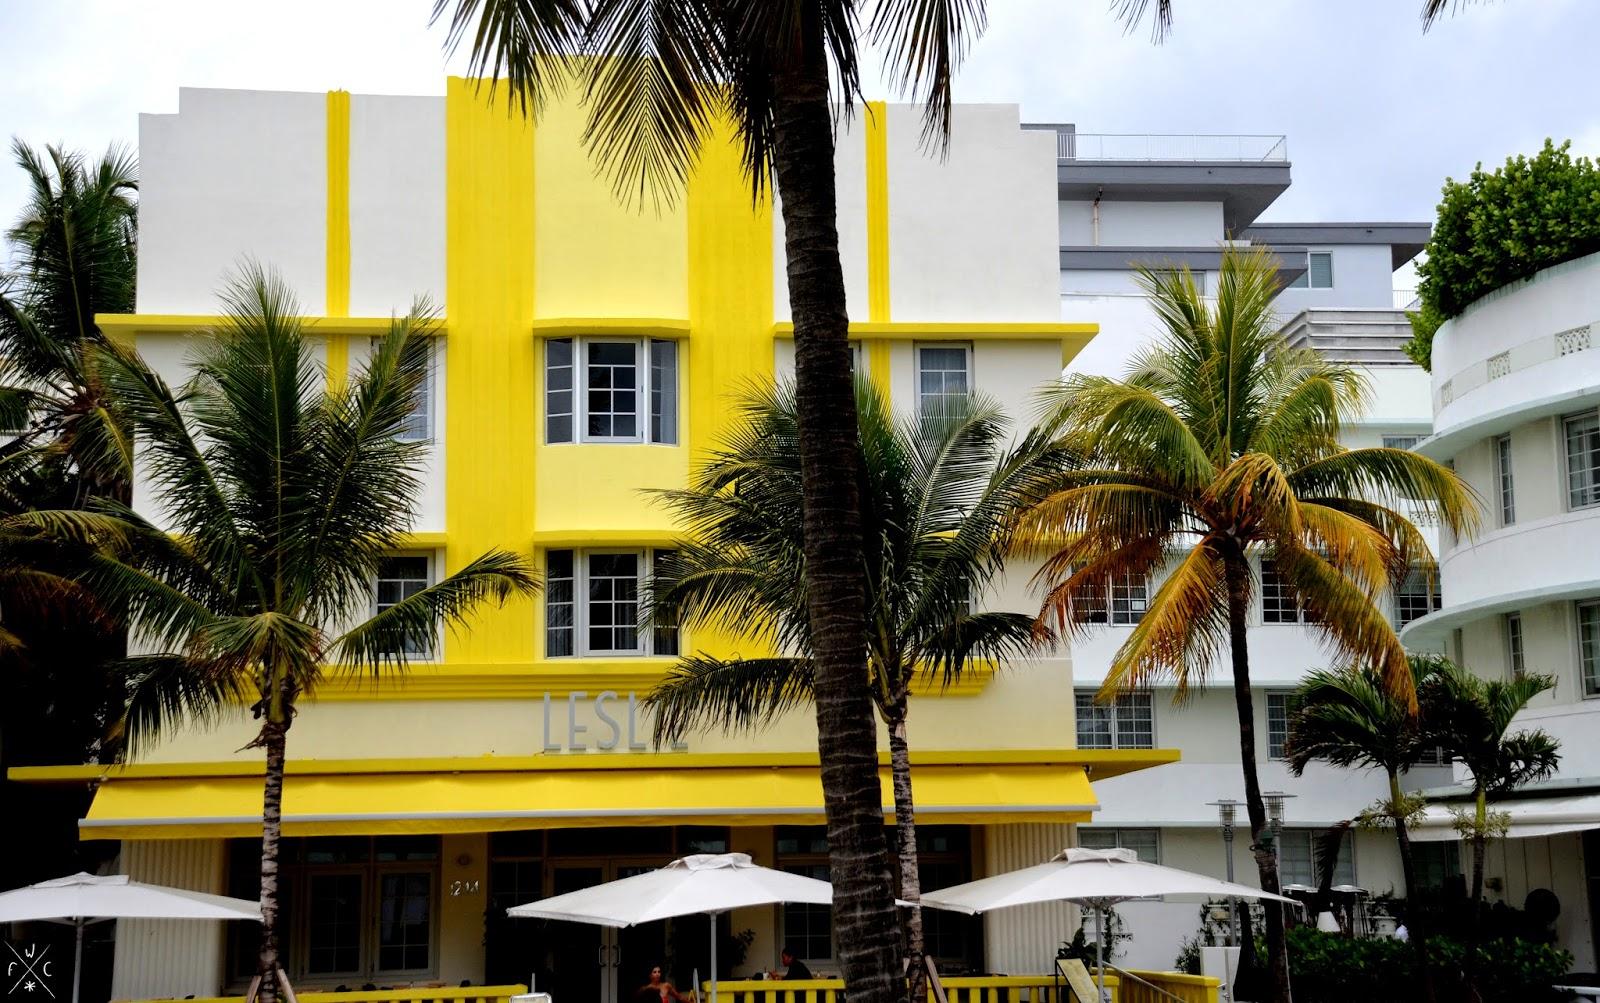 Leslie - Miami Beach, Floride, USA - Art Déco